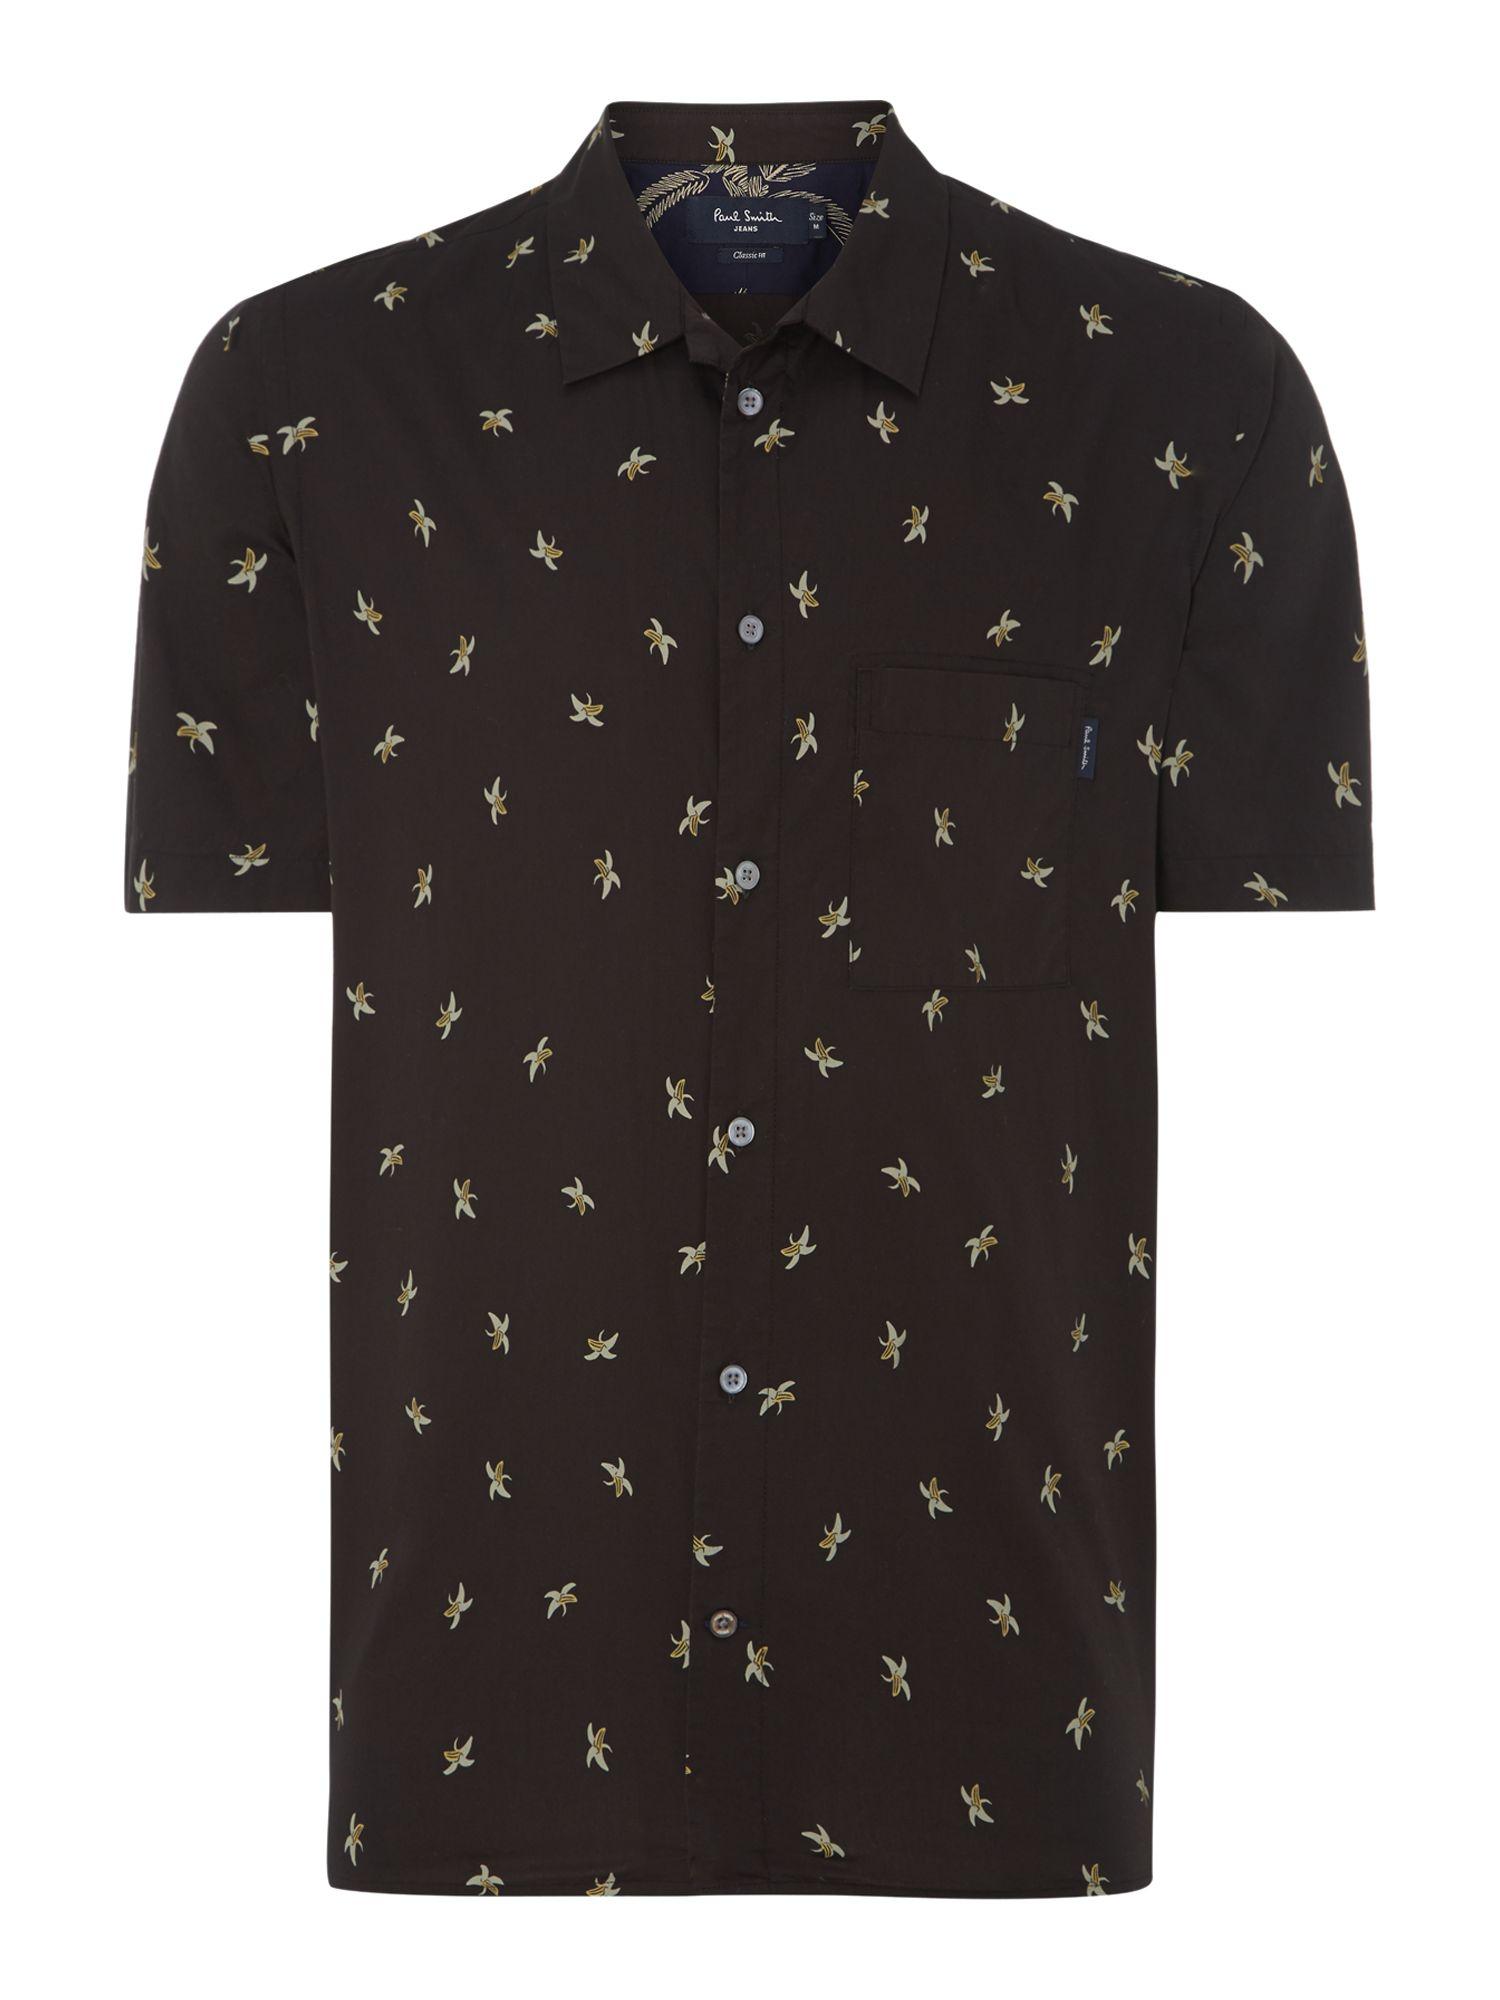 Paul Smith Shortsleeve Banana Print Shirt In Black For Men